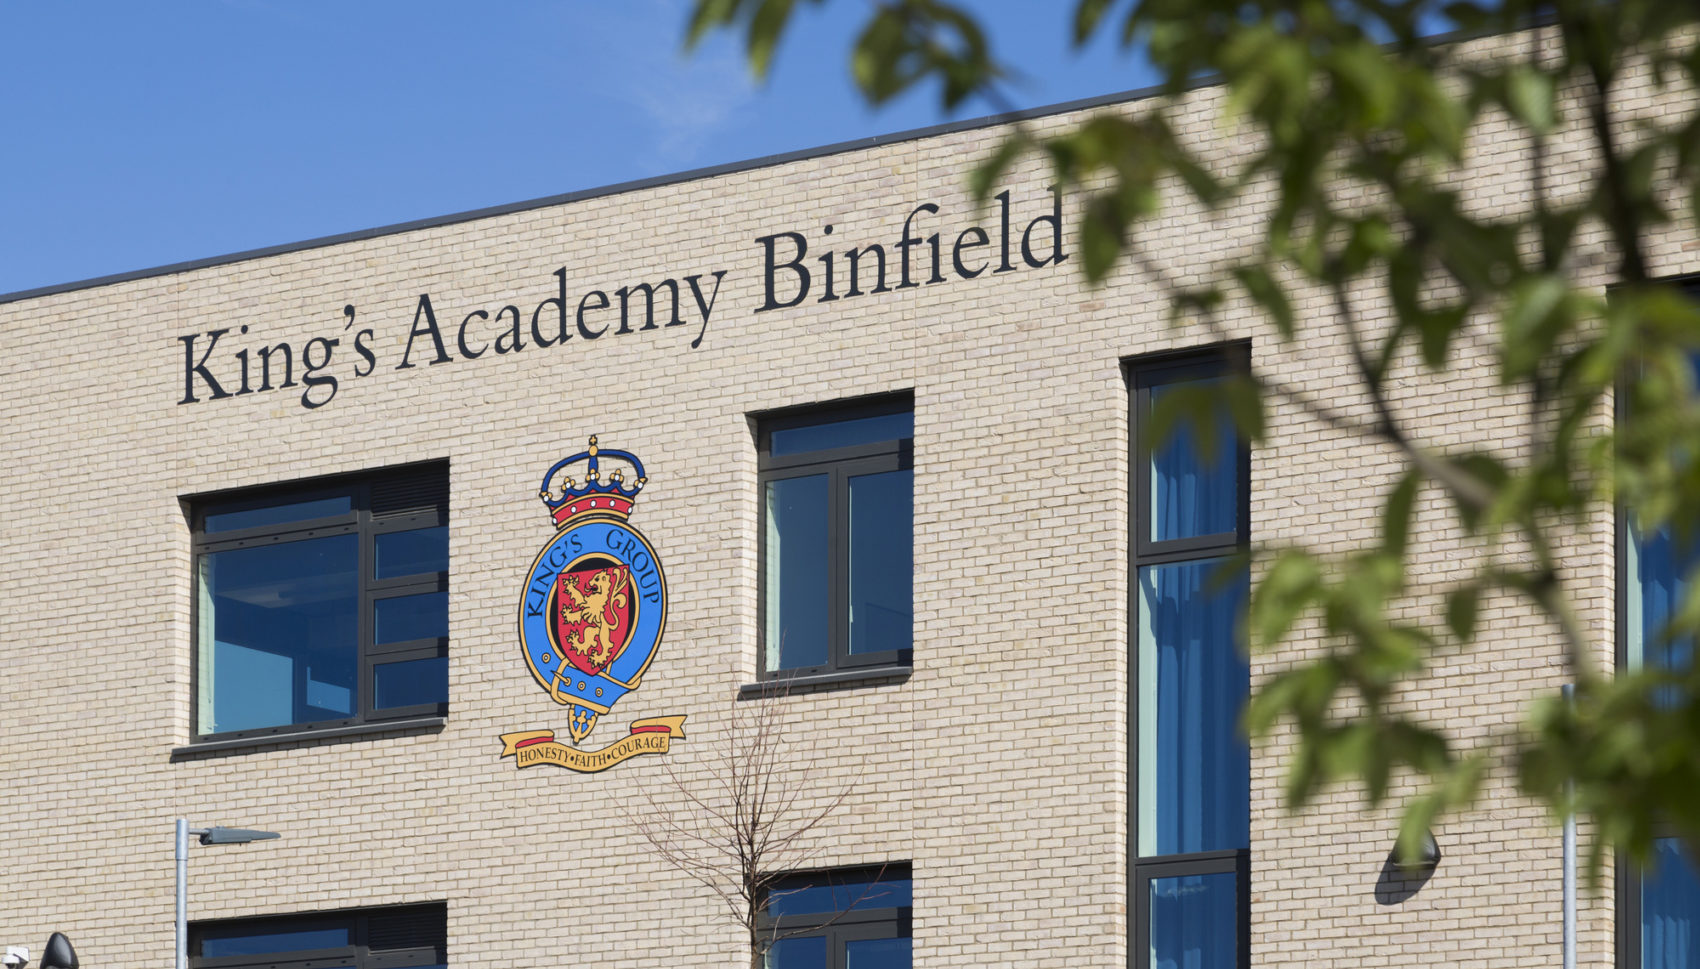 King's Academy Binfield